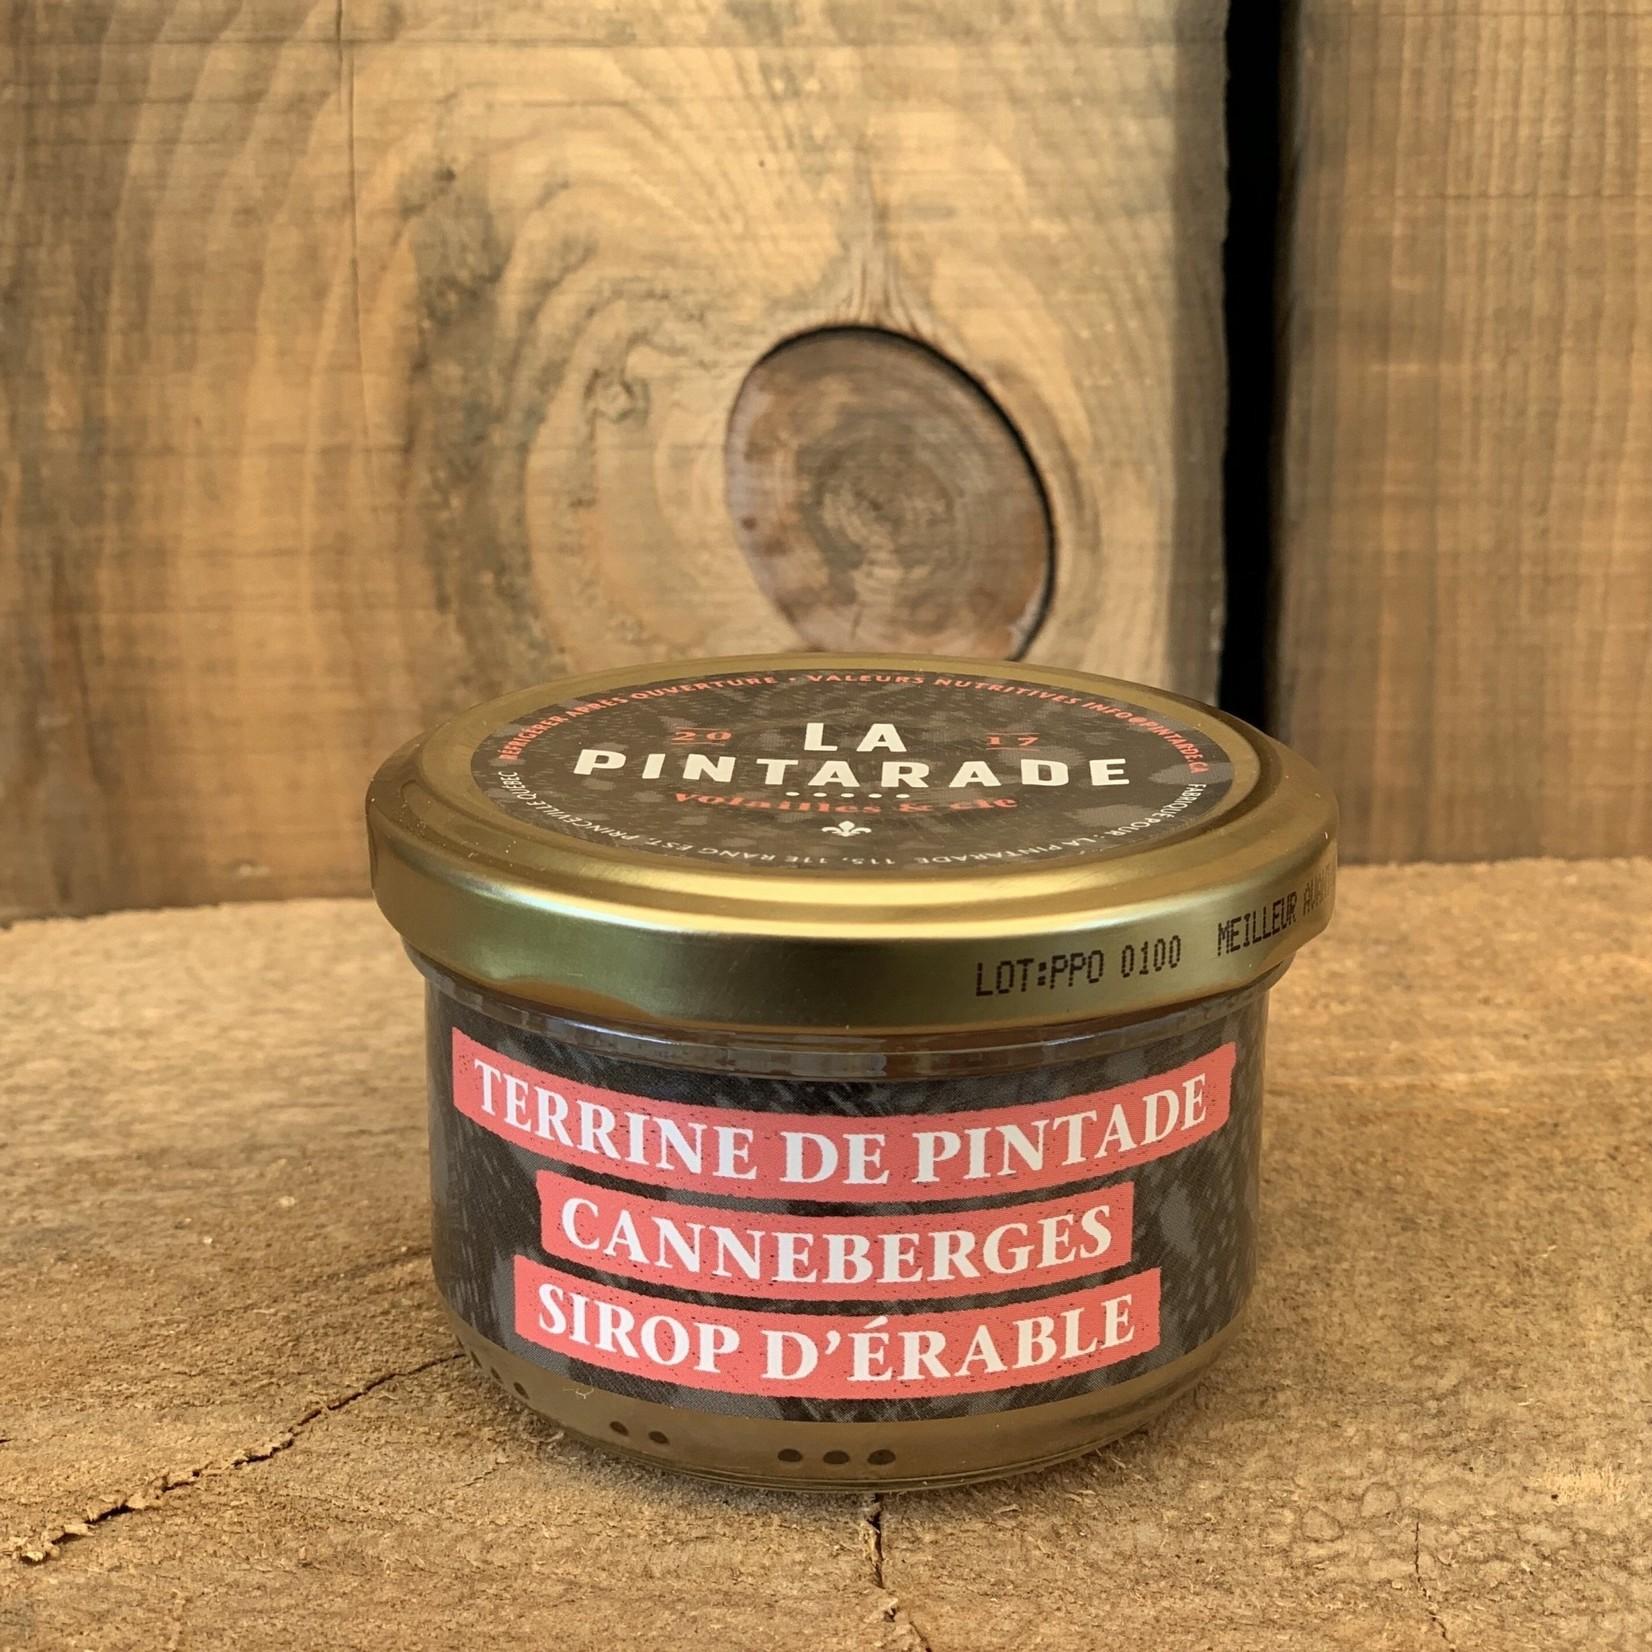 Terrine de Pintade - Canneberges Sirop D'Érable